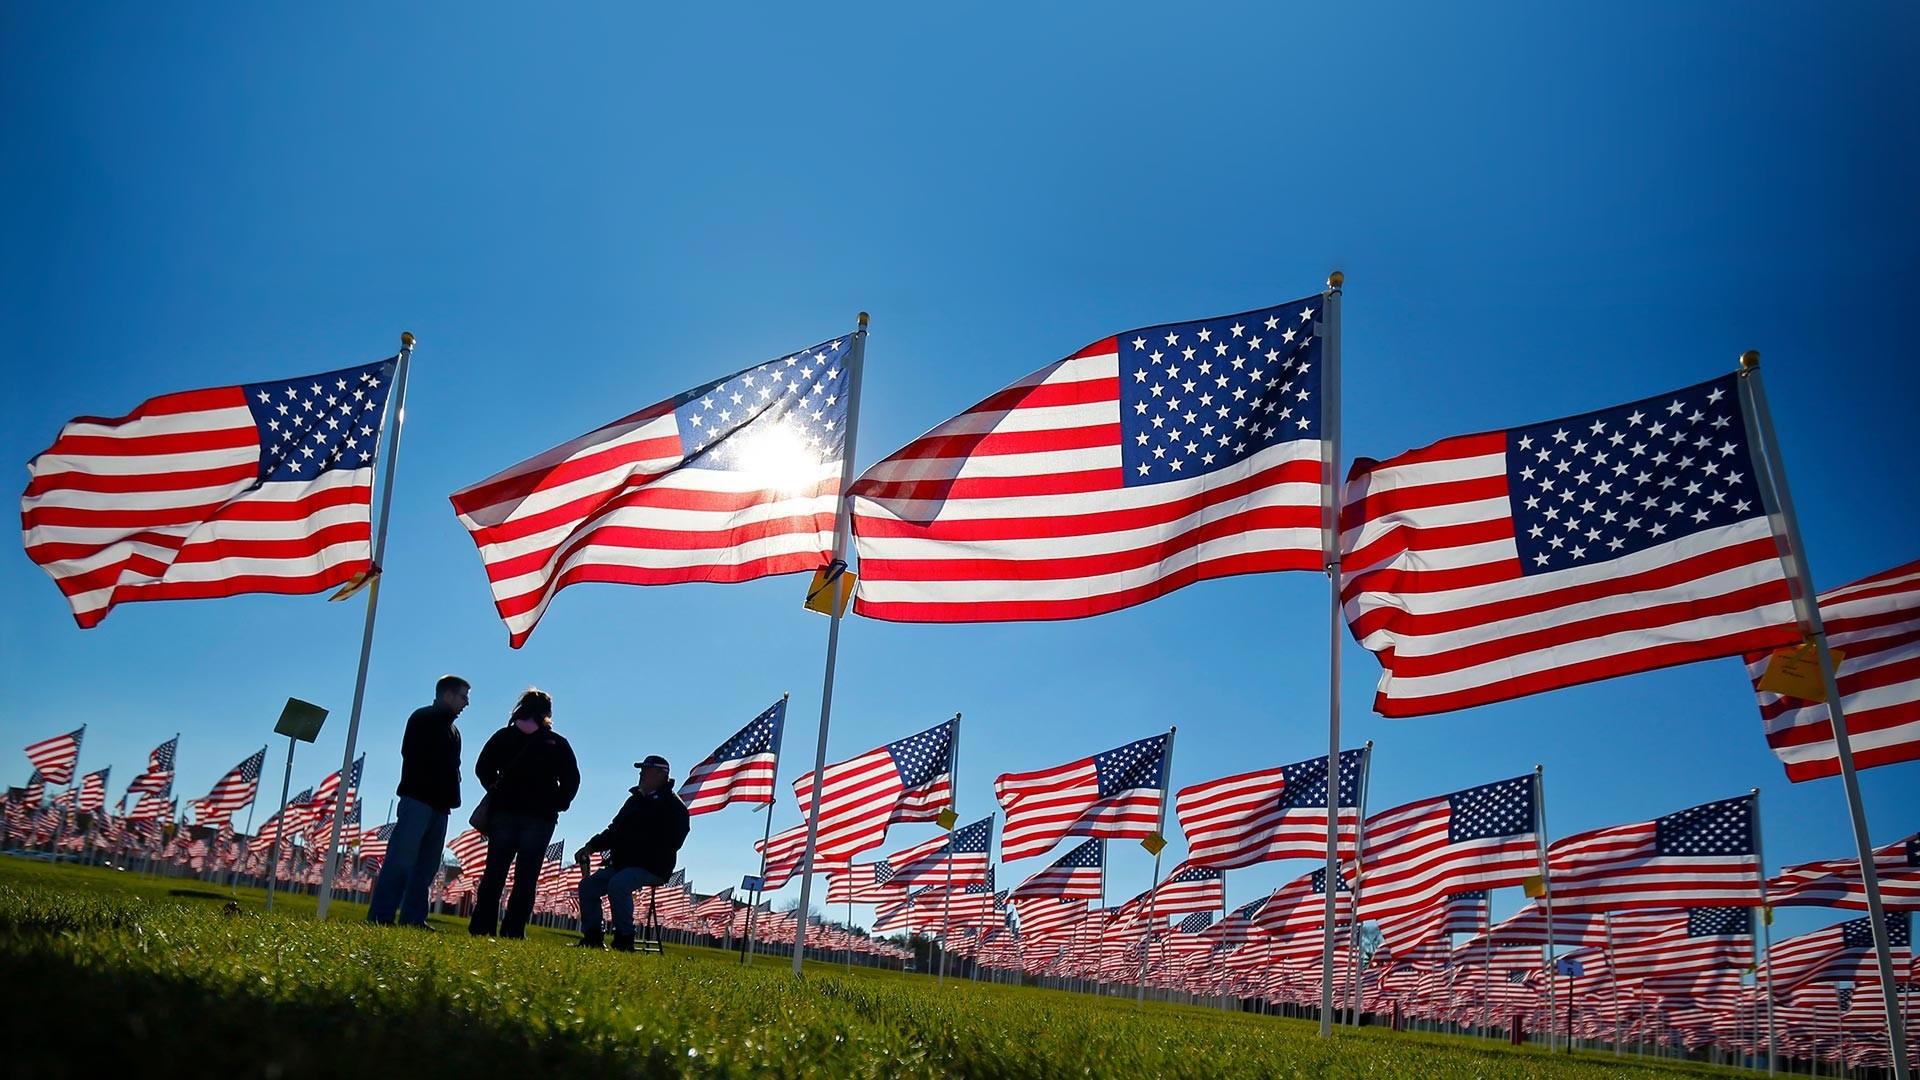 Veterans Day wallpaper photo hd